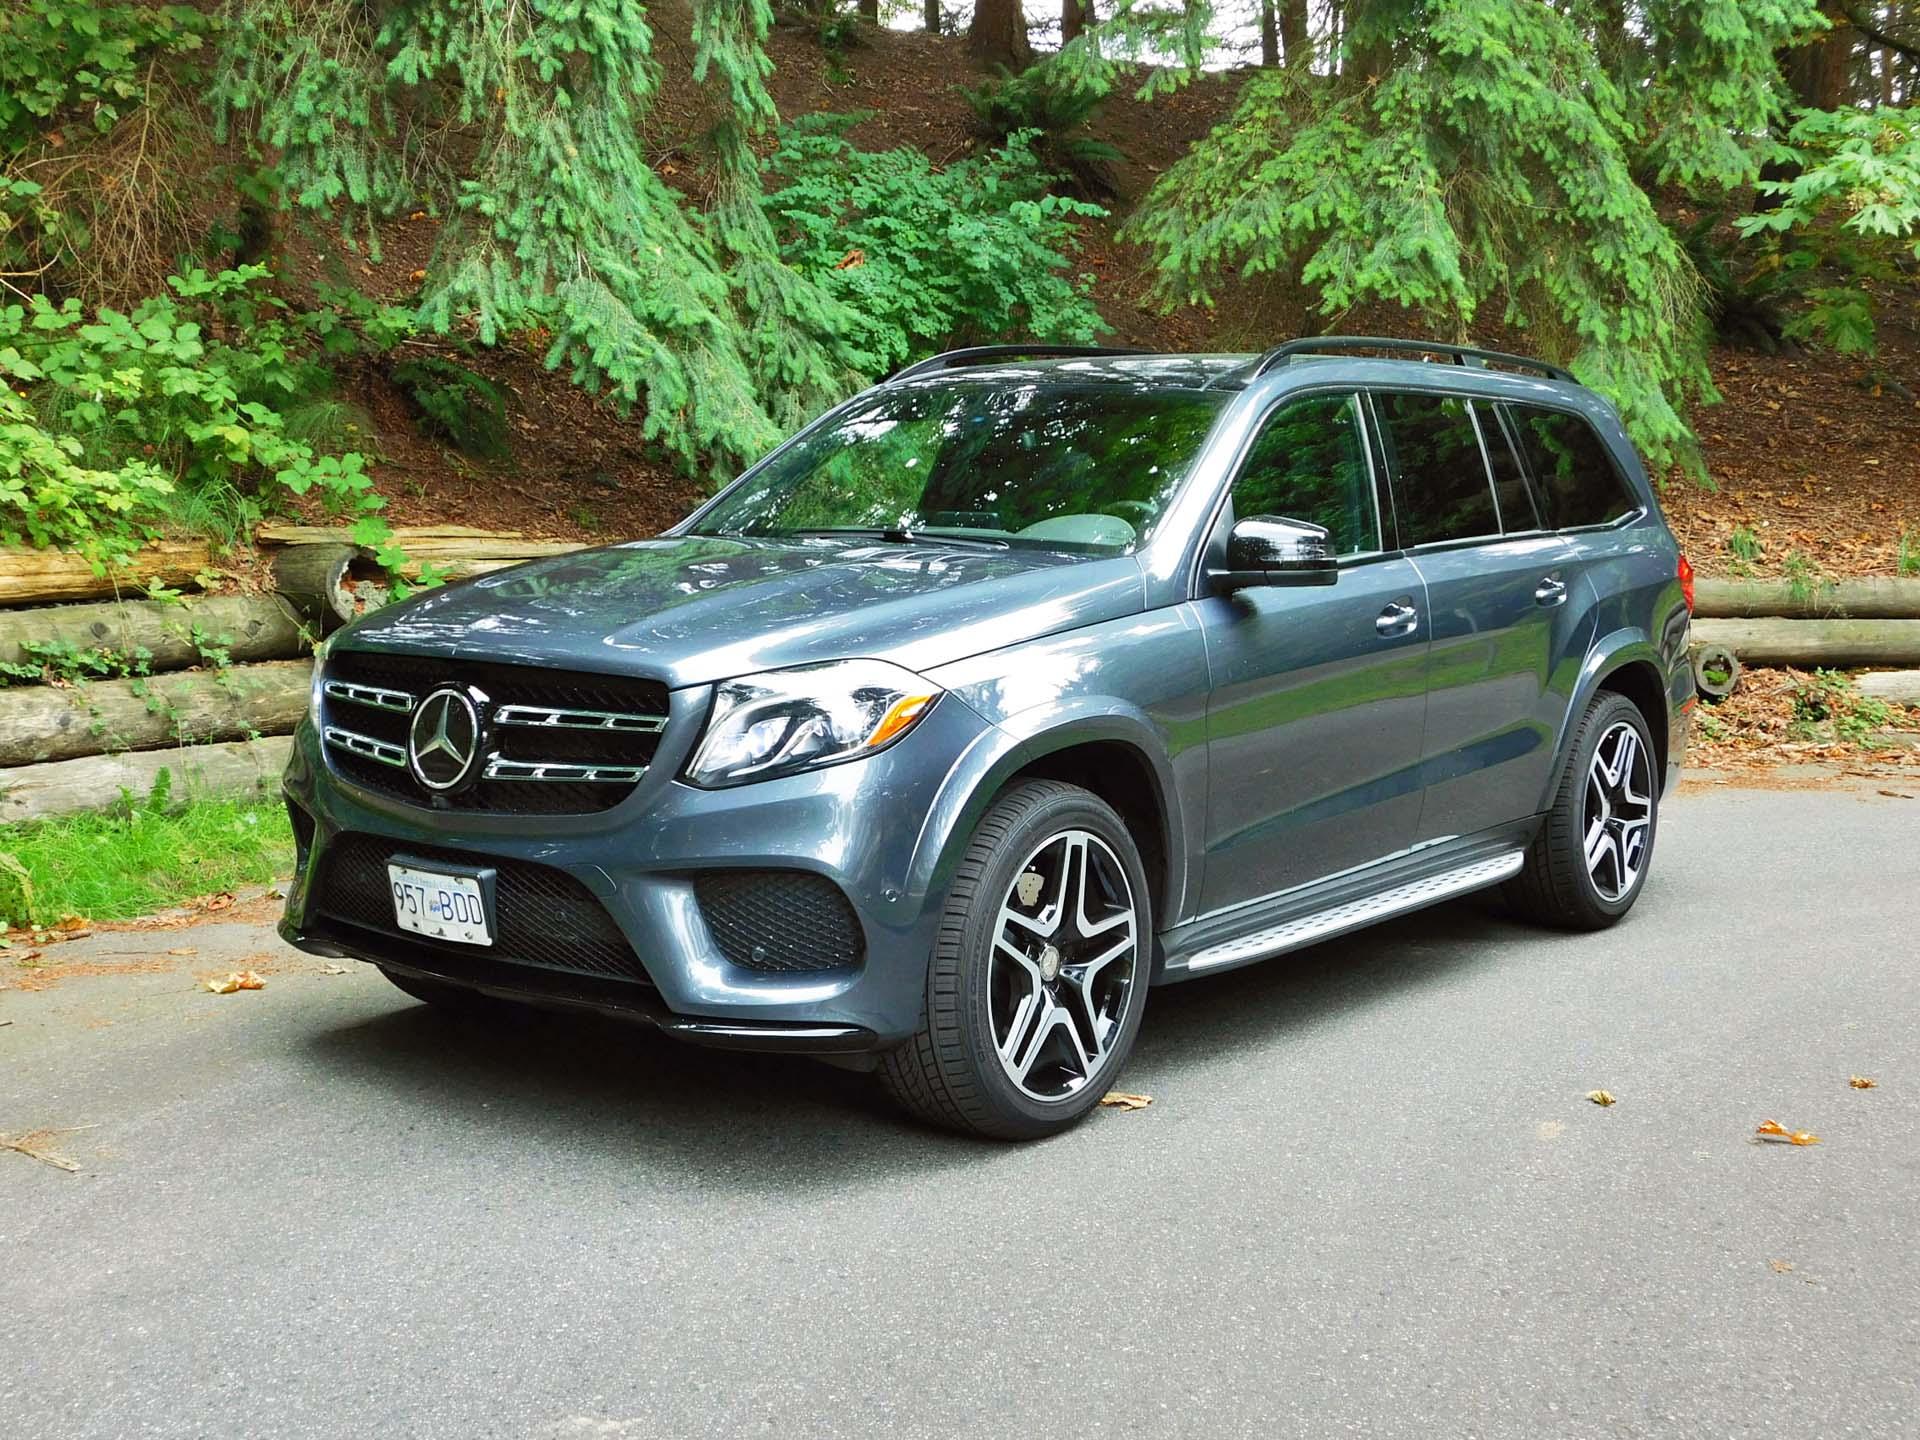 2017 mercedes benz gls 450 for Mercedes benz gls450